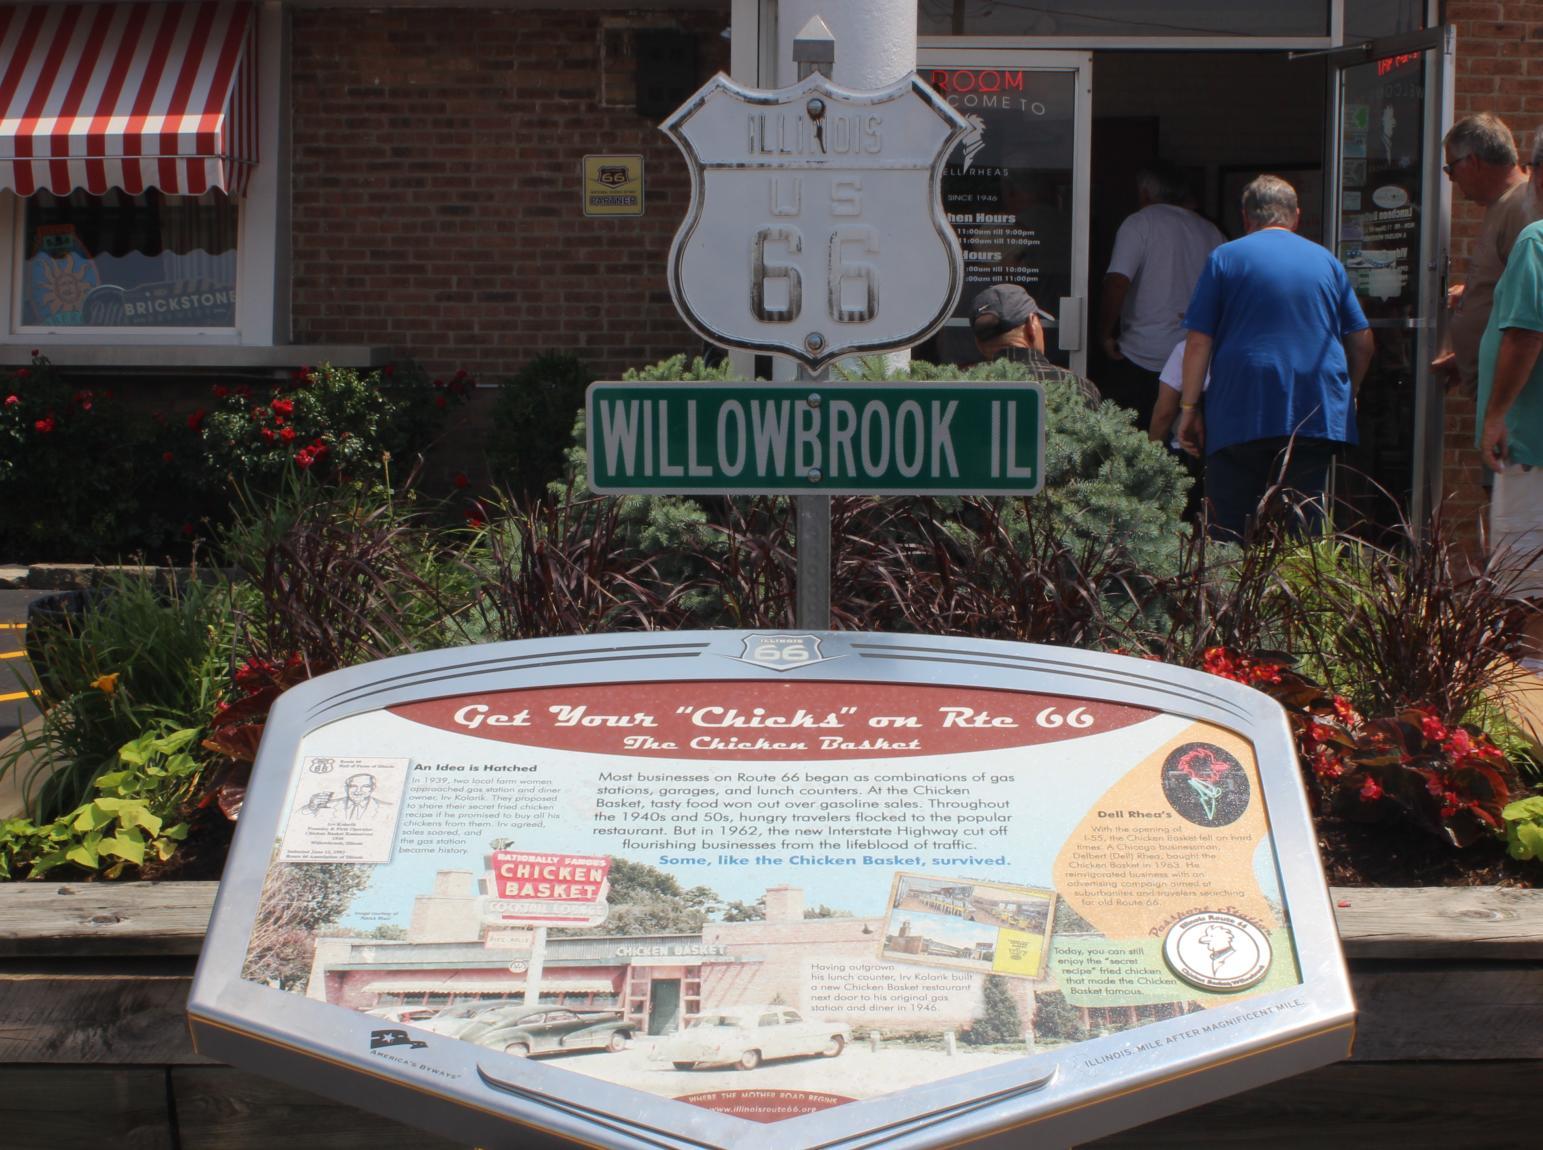 Secondary Navigation - Willowbrook